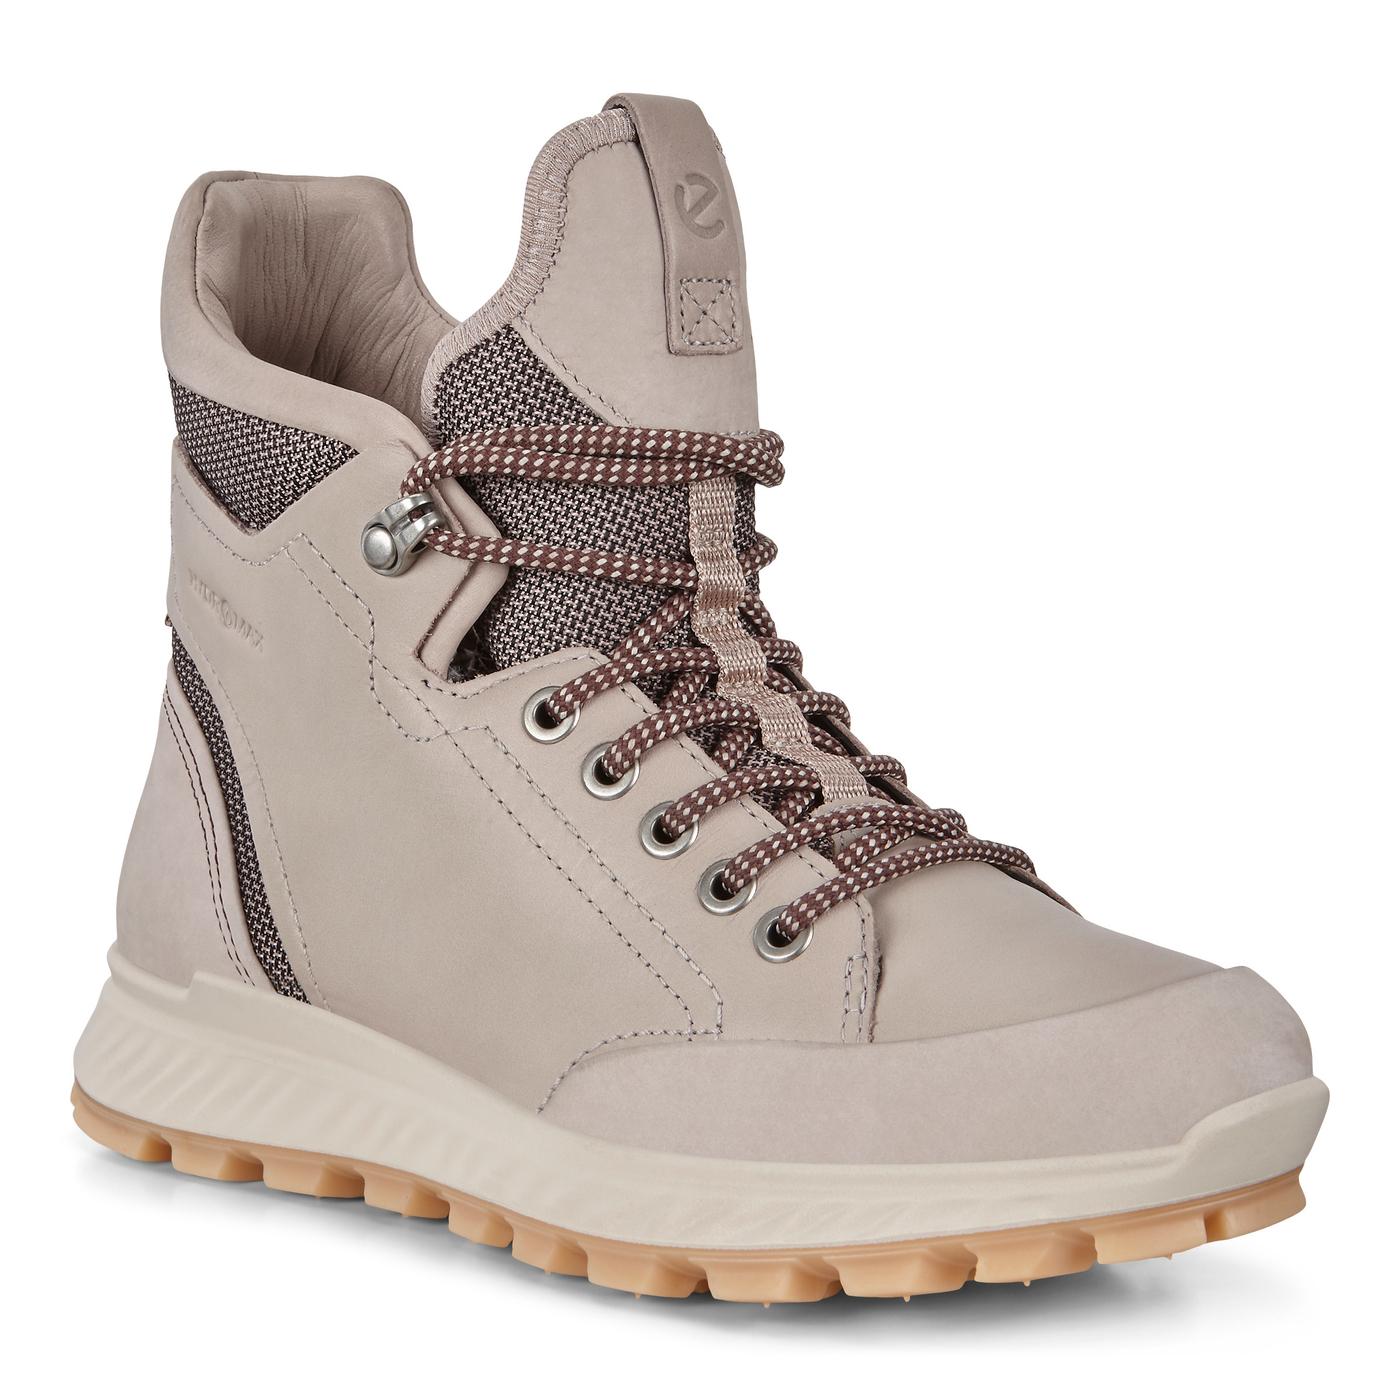 ECCO EXOSTRIKE L Shinebright Outdoor Ankle Boot HM